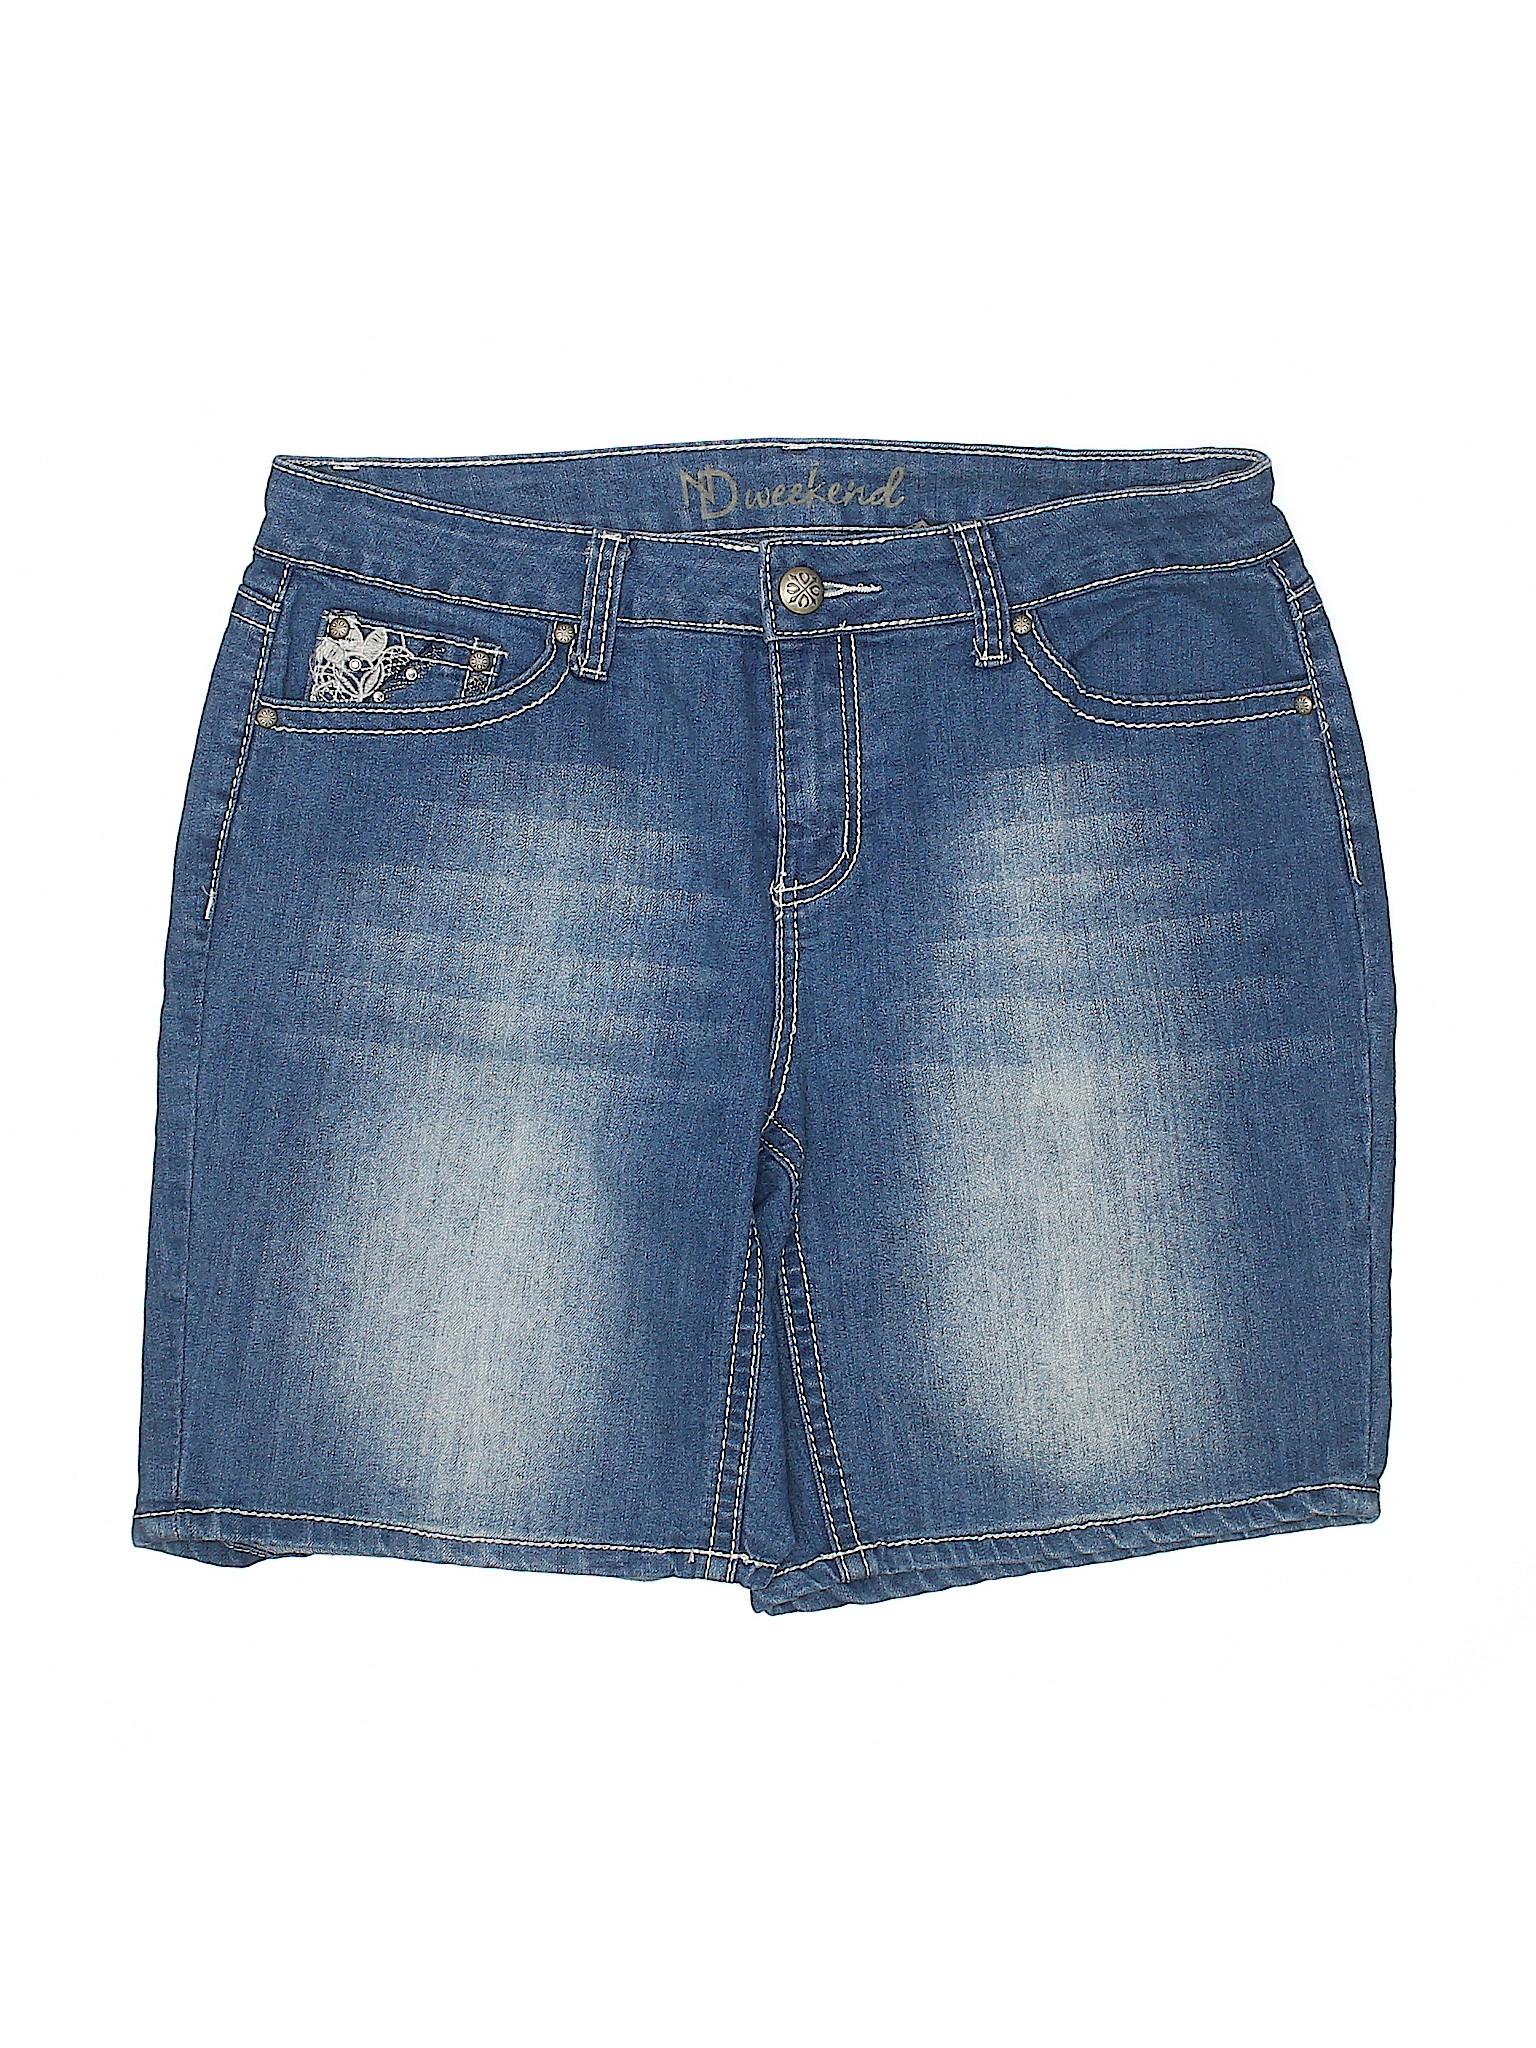 Boutique New Directions Denim New Boutique Shorts cwwrB04Rq